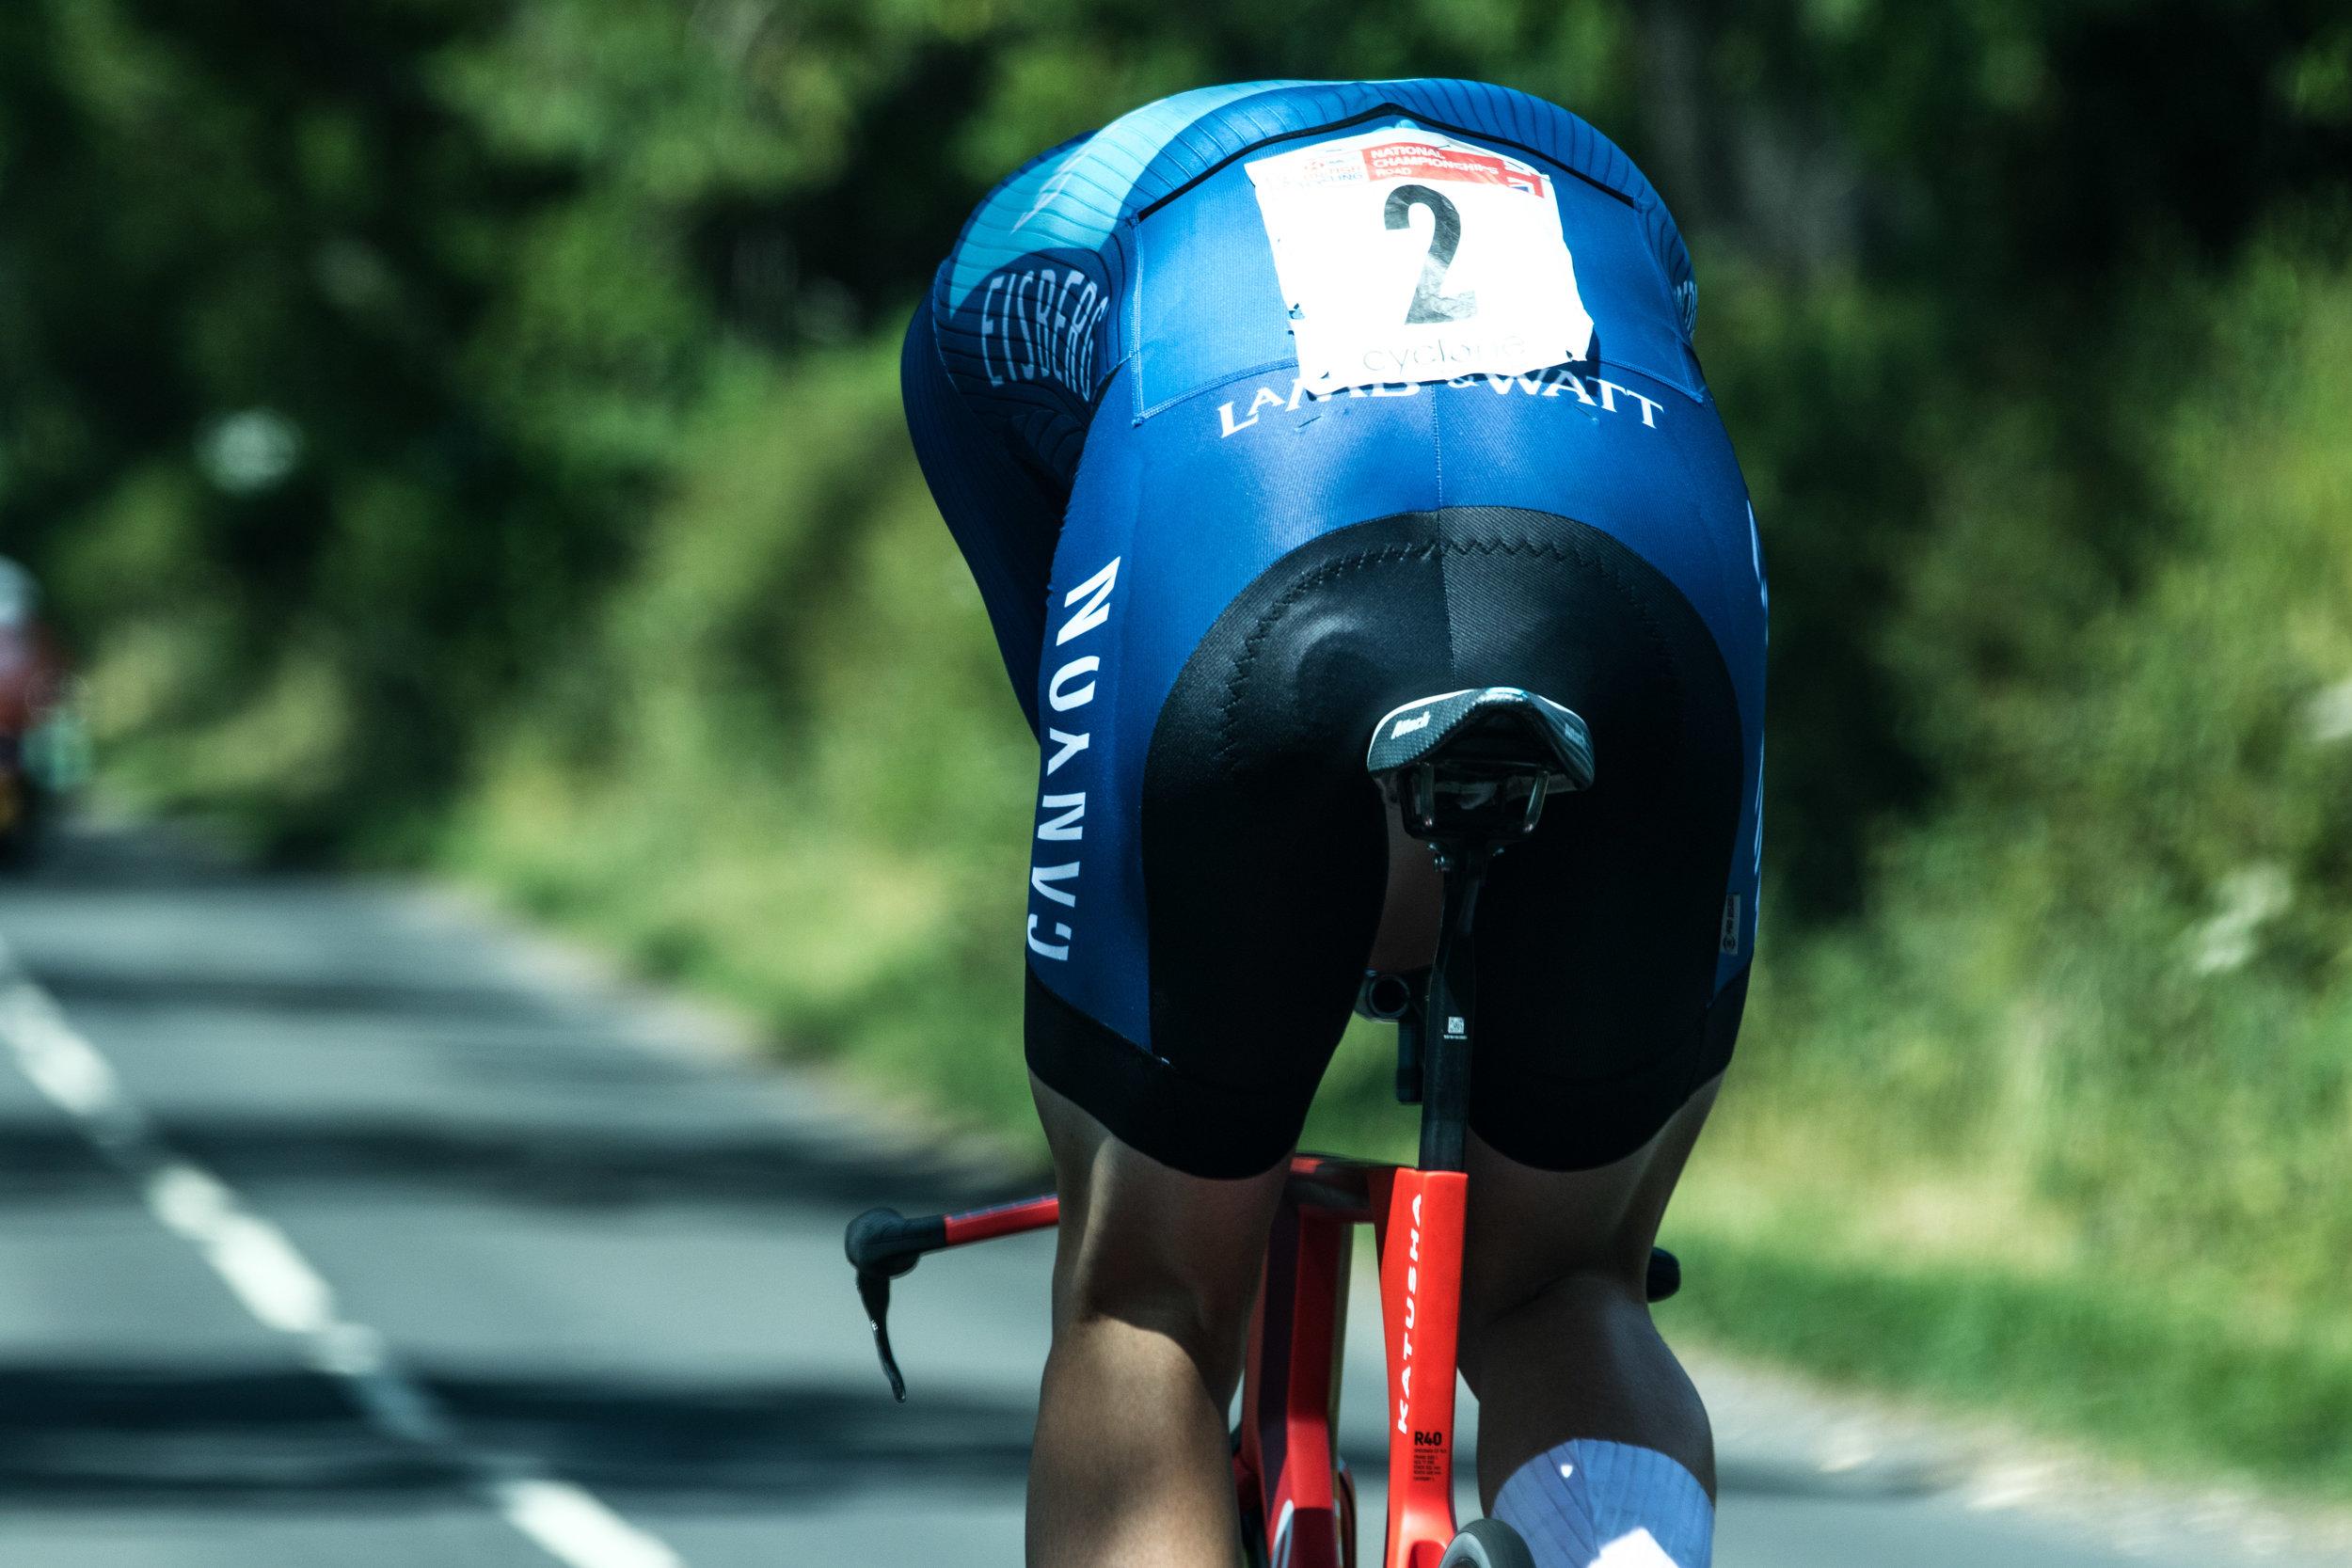 Charlie Tanfield TT U23-8.jpg